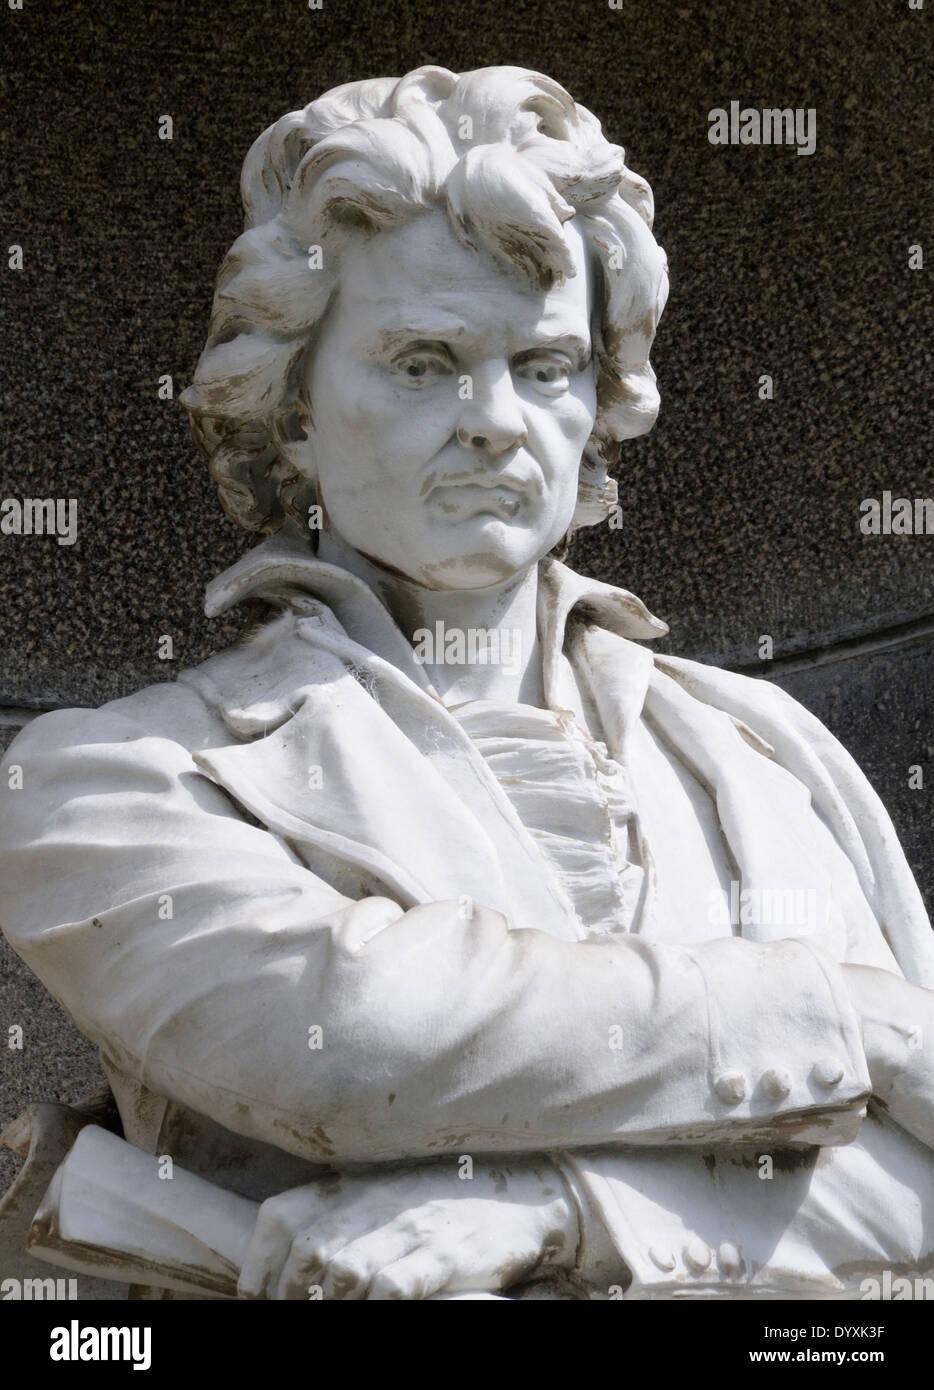 Statue of Ludwig van Beethoven outside the Teatro Nacional, National Theatre, Plaza de la Cultura. San Jose, Costa Rica. - Stock Image